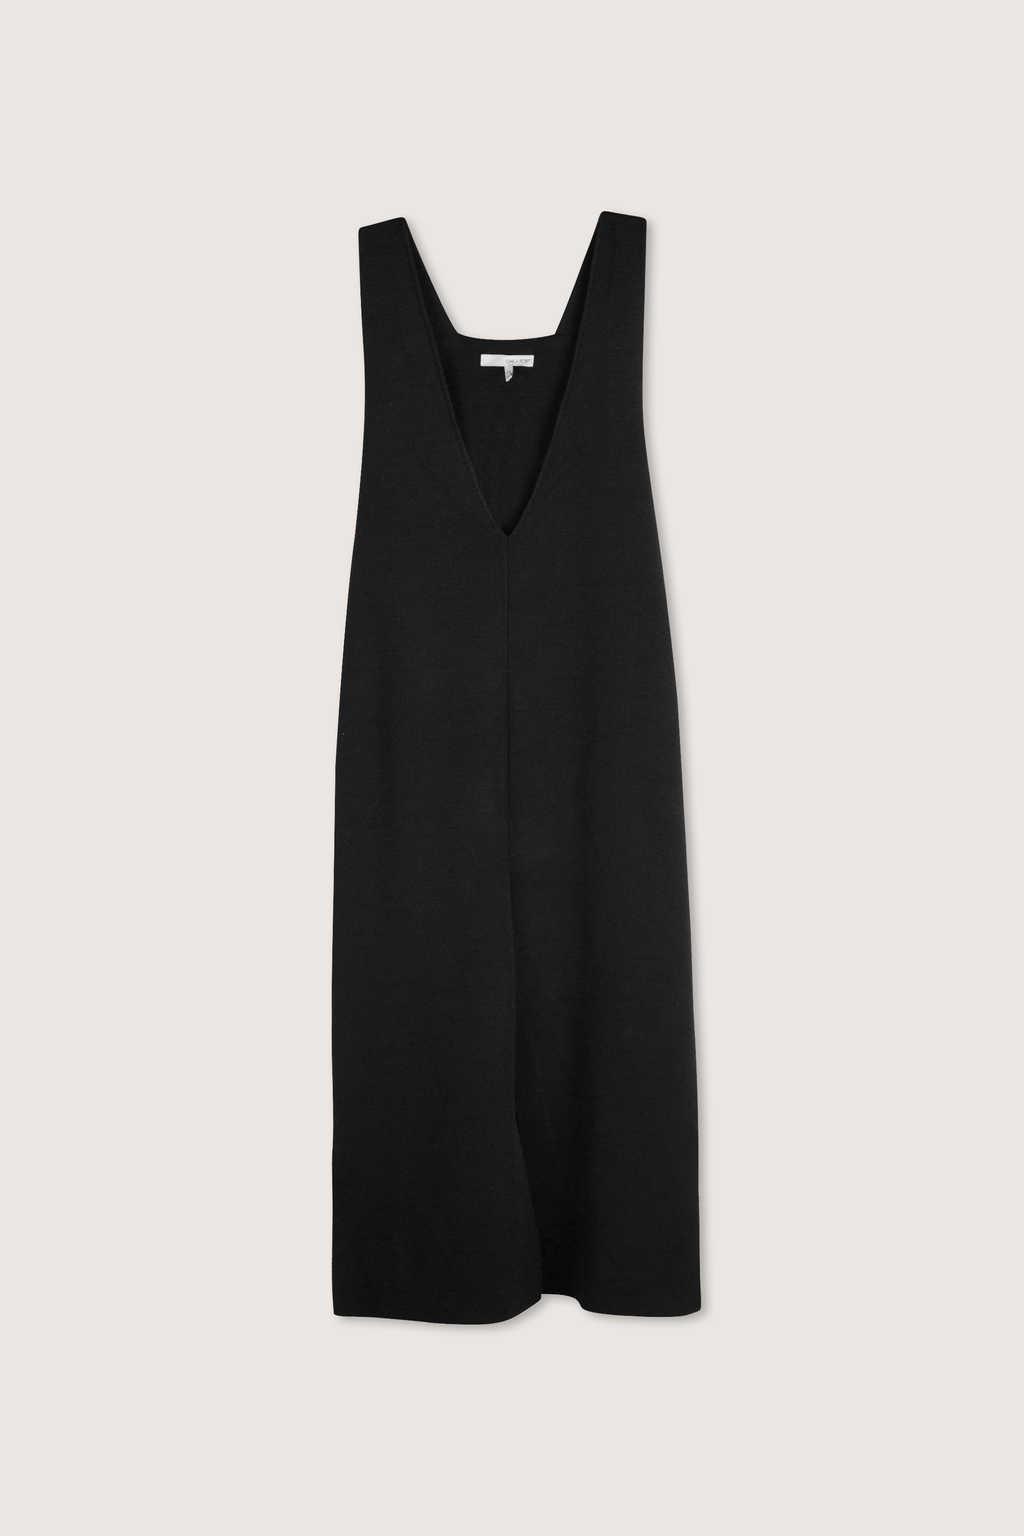 Dress H316 Black 7